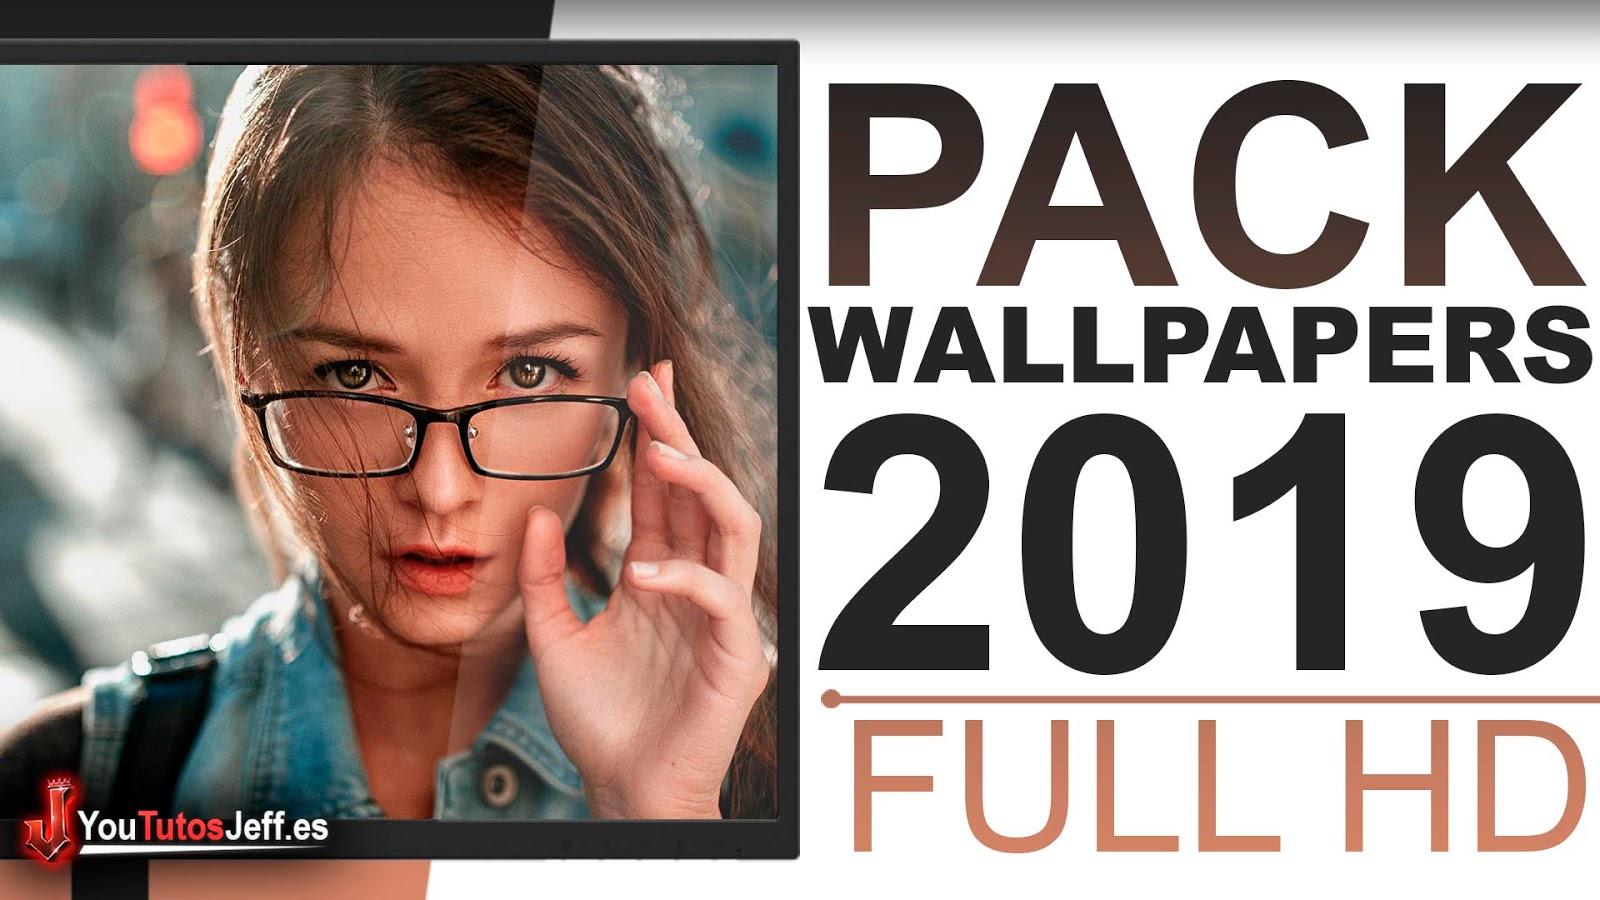 Pack de Wallpapers FULL HD 2019 #3